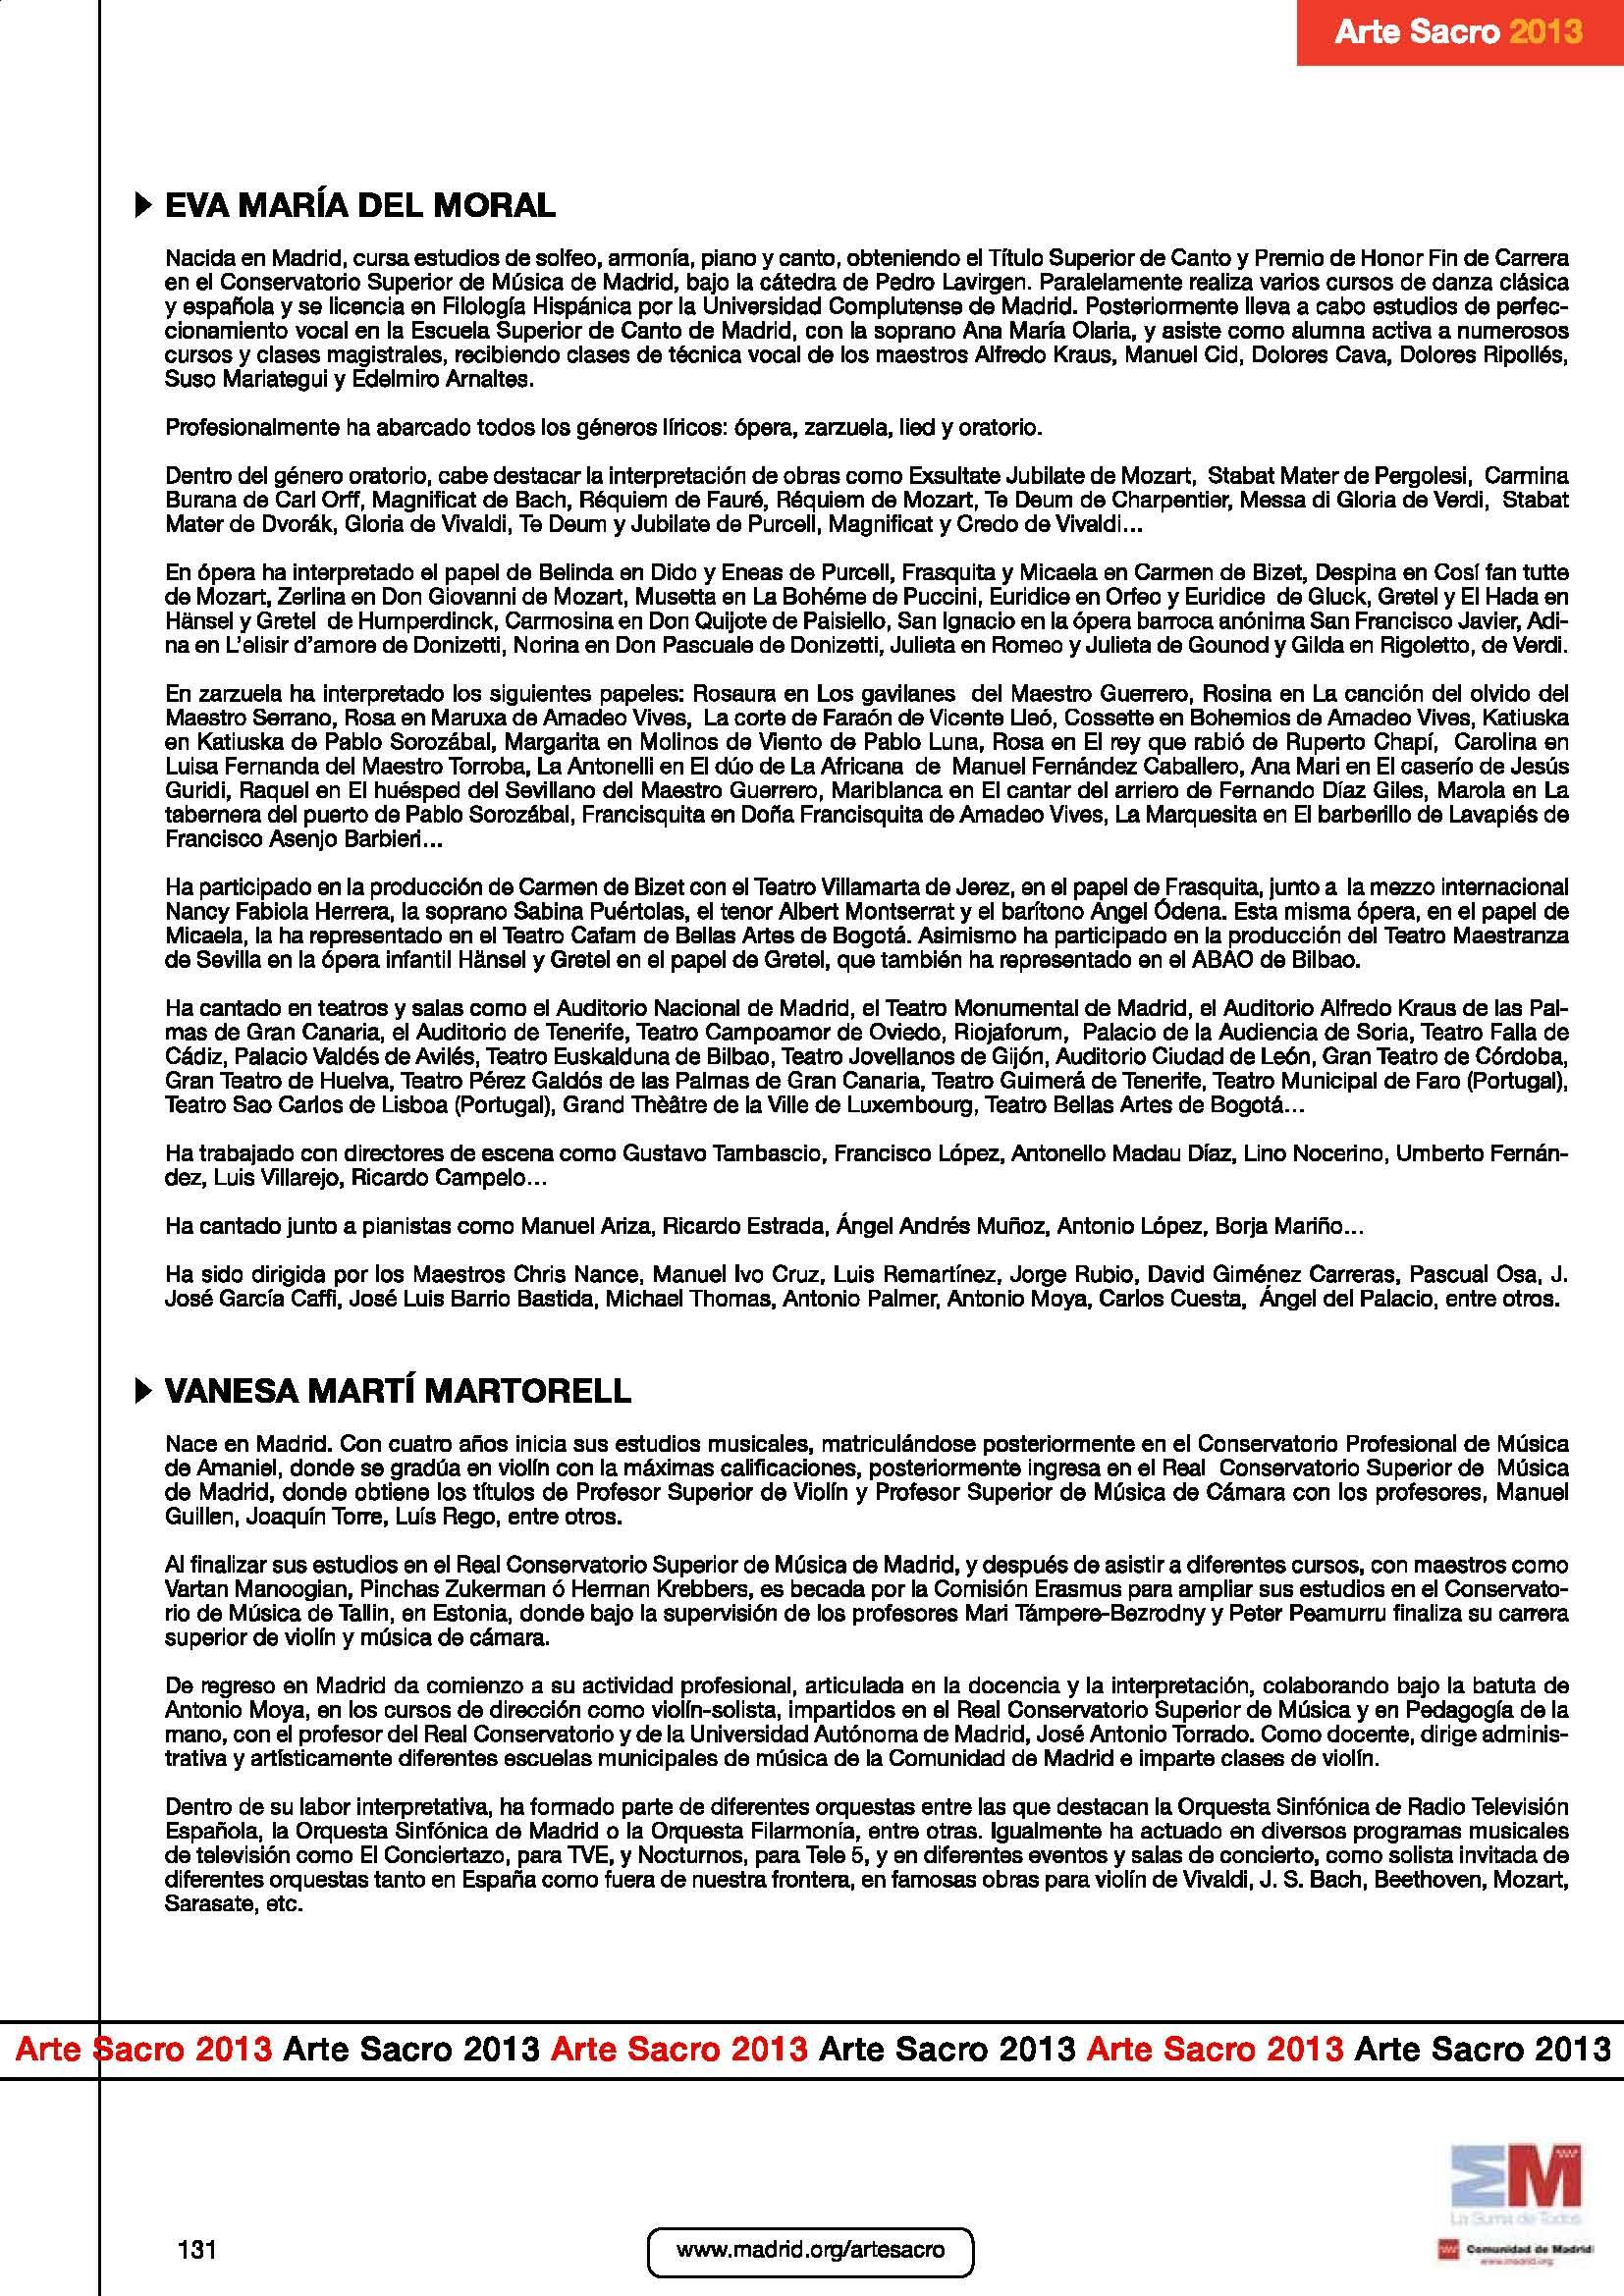 dossier_completo_Página_131